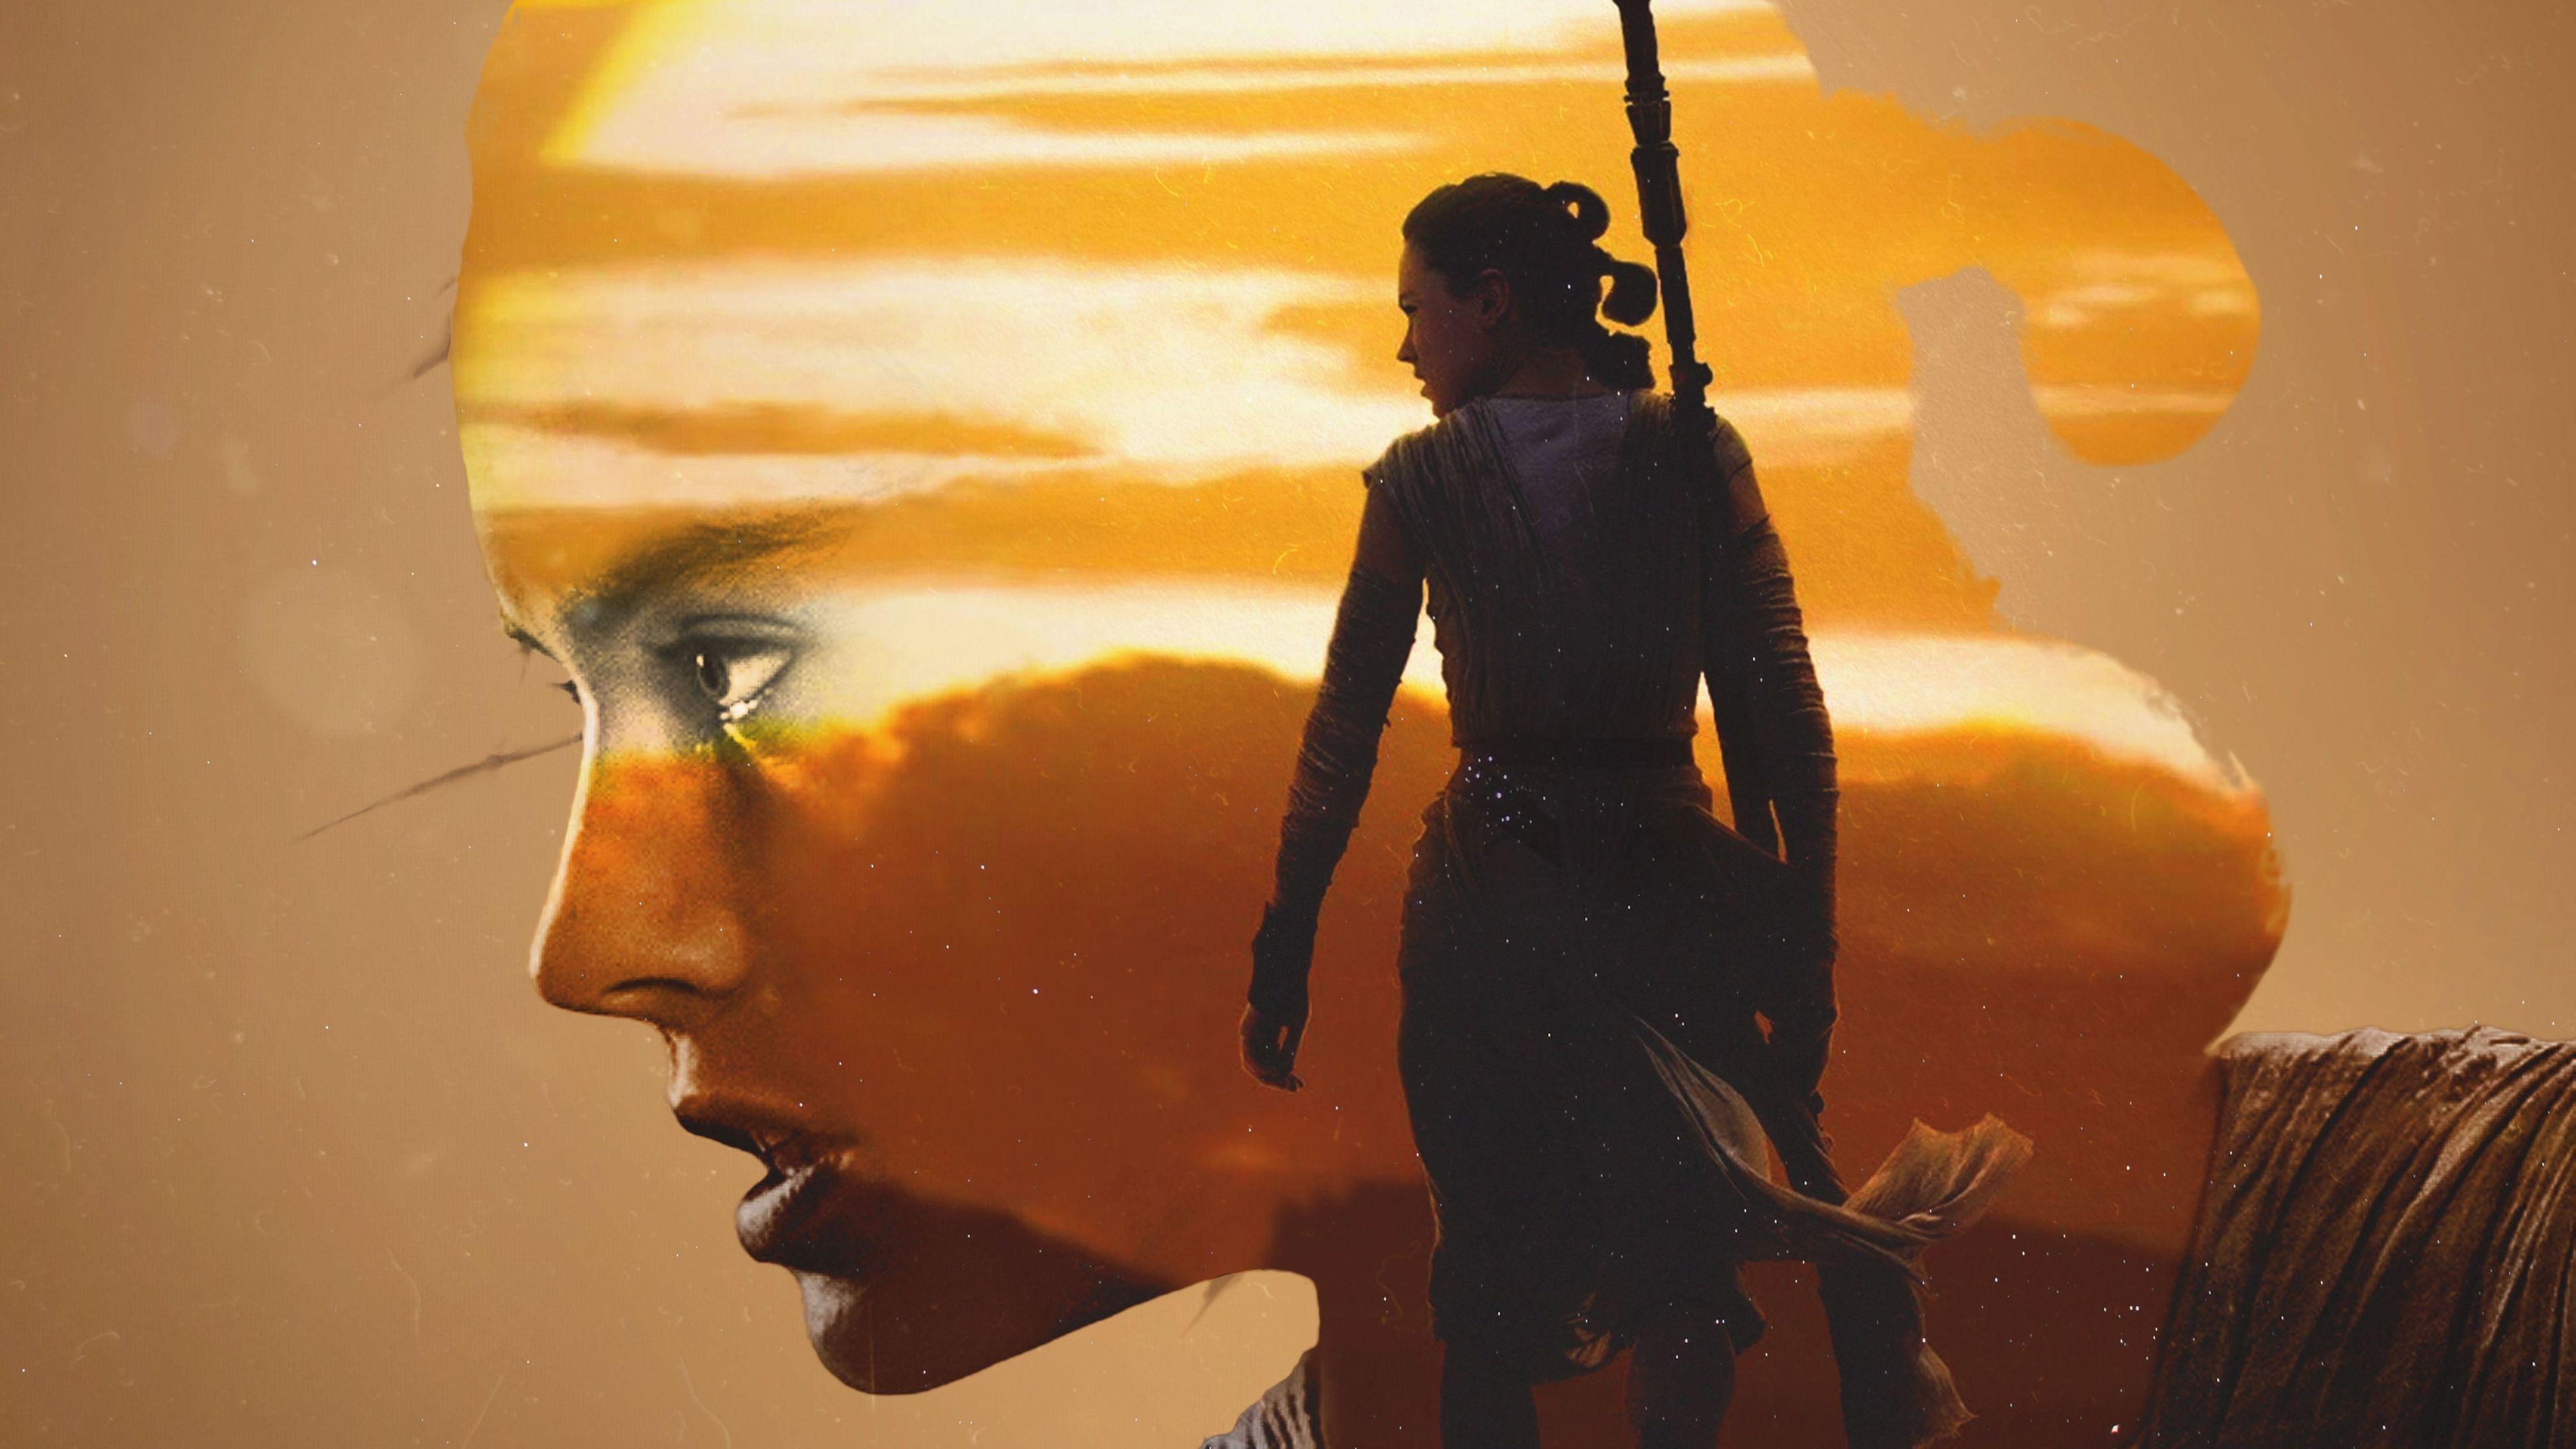 Rey Star Wars Artwork Rey Star Wars Art 3840x2160 Wallpaper Teahub Io